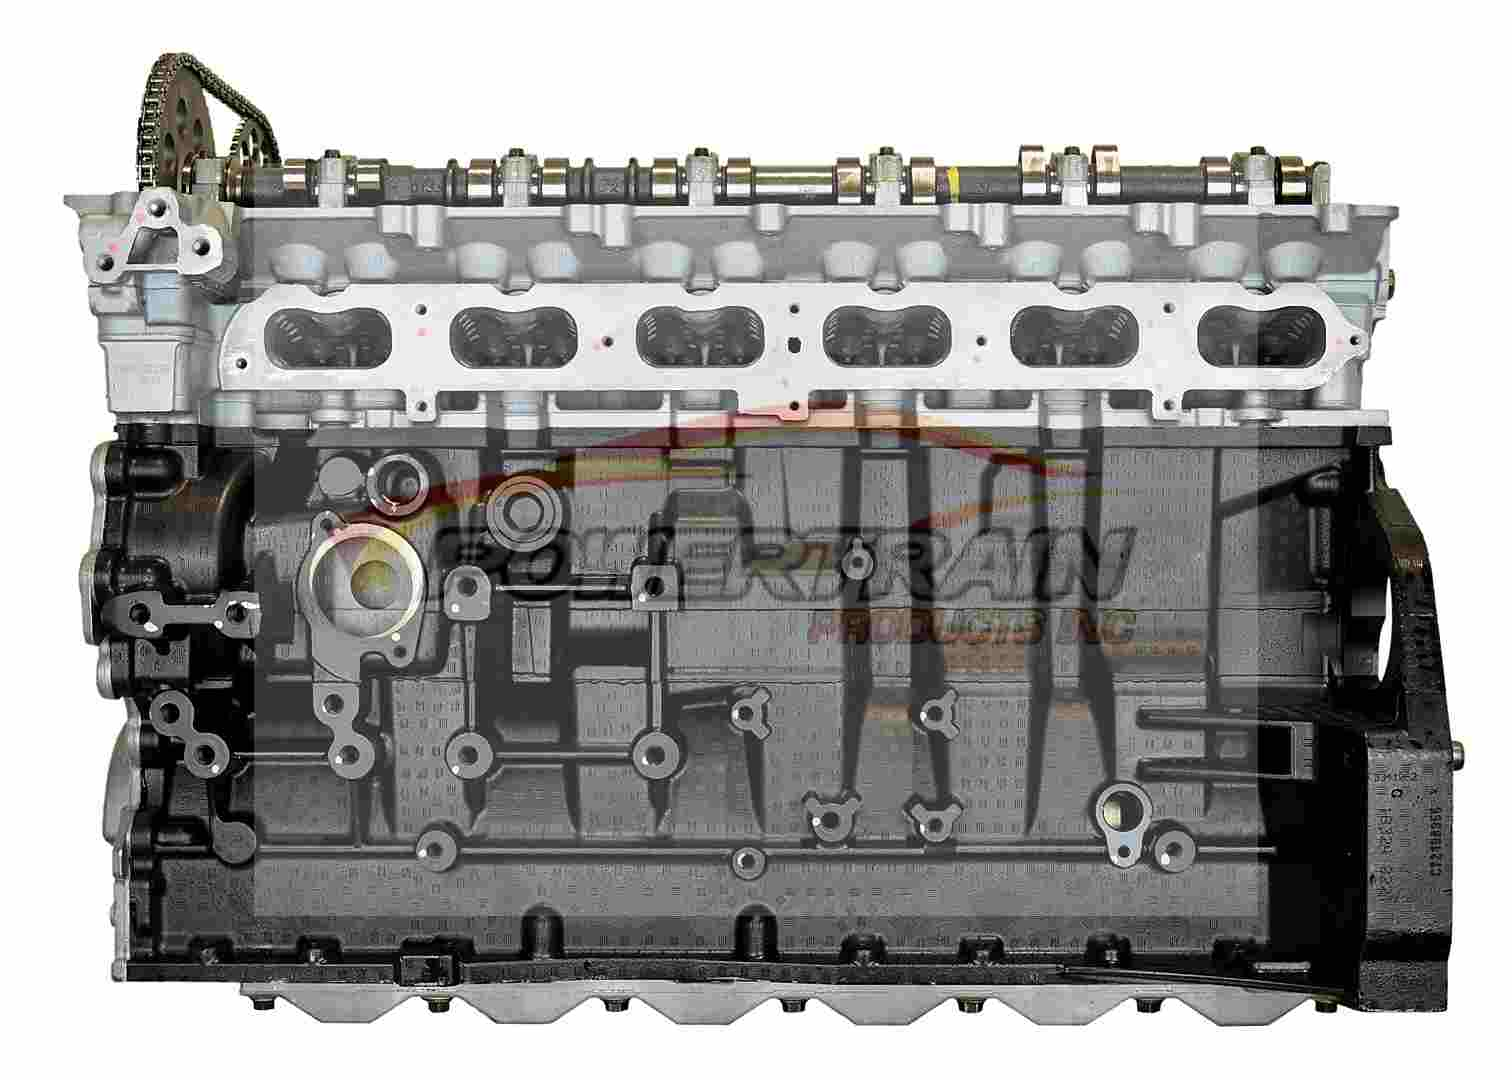 2005 chevy trailblazer engine